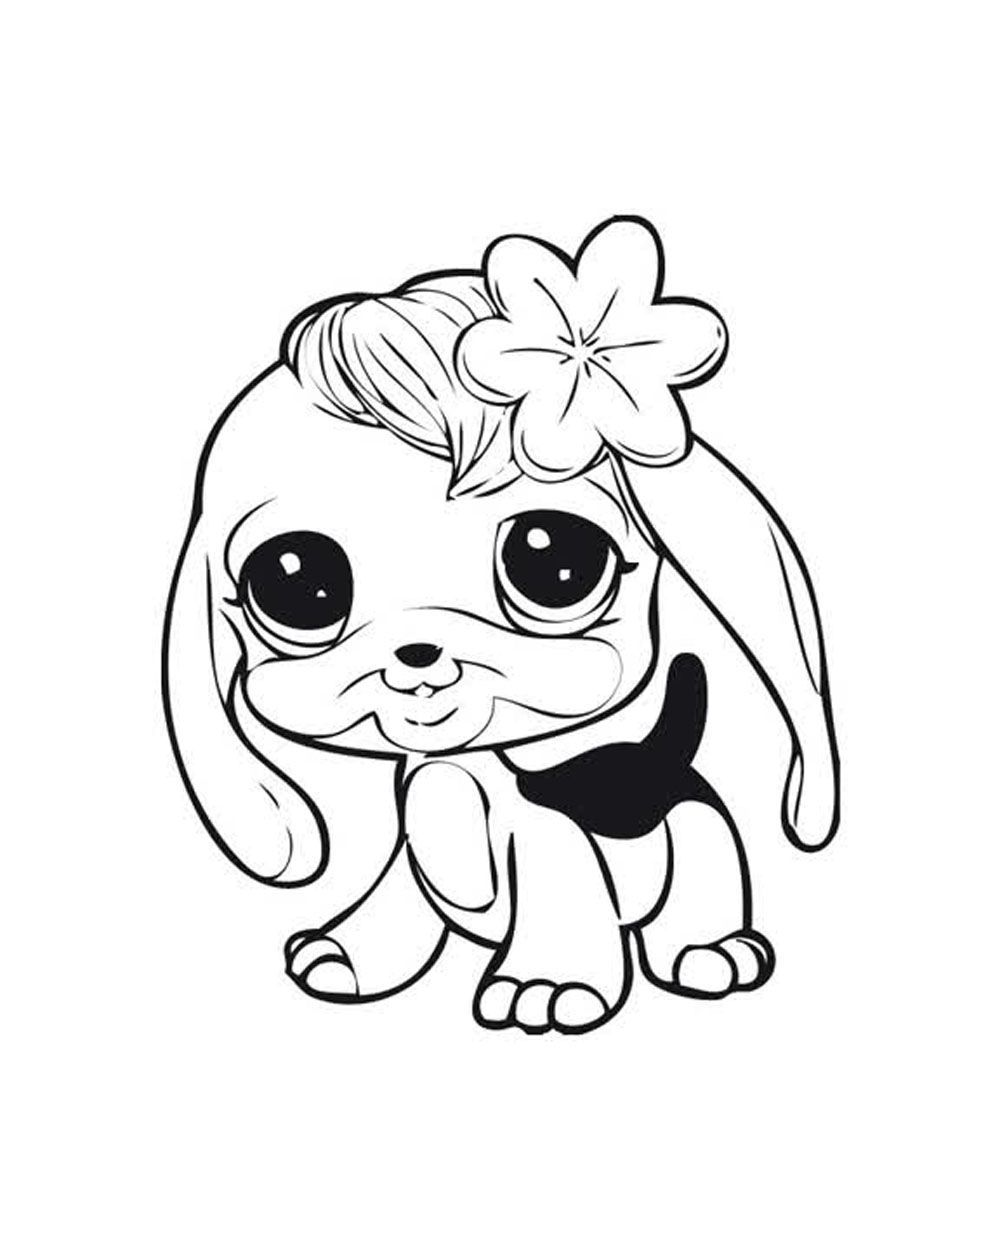 Coloring pages for littlest pet shop - Littlest Pet Shop Coloring Pages Inspiring Coloring Pages